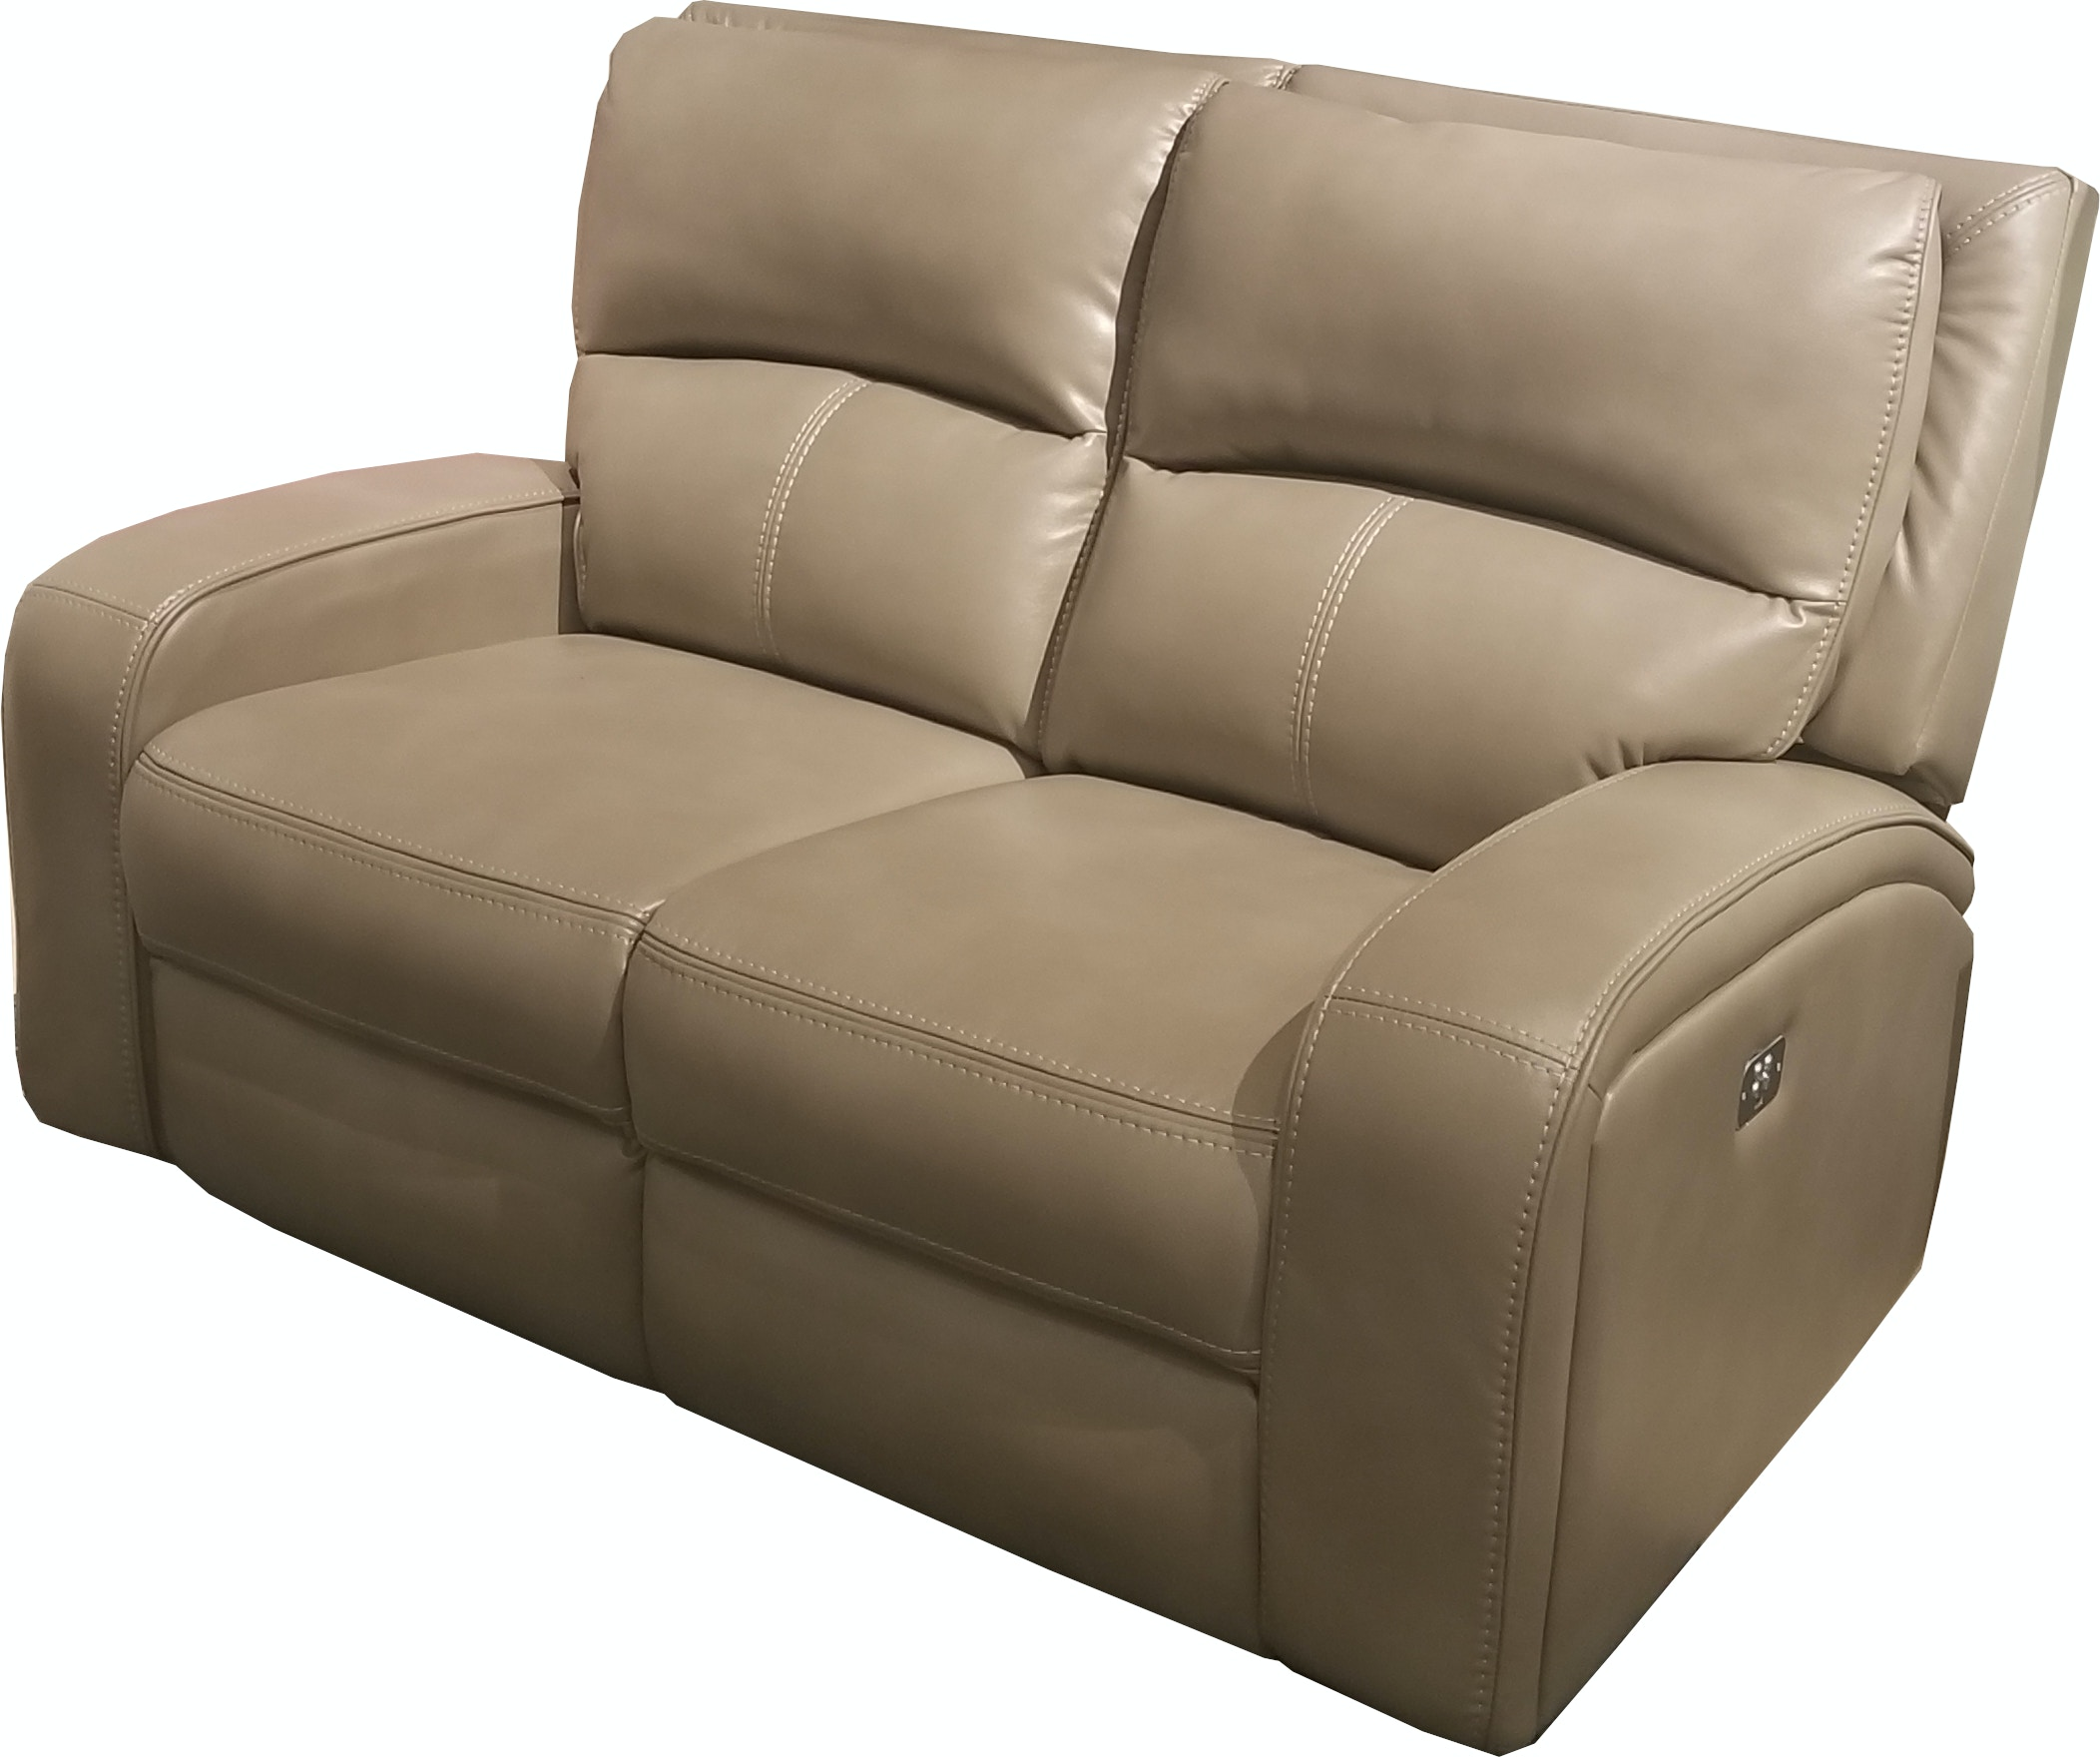 living room loveseats idea india finesse furniture interiors edmonton flynn dual power motion loveseat